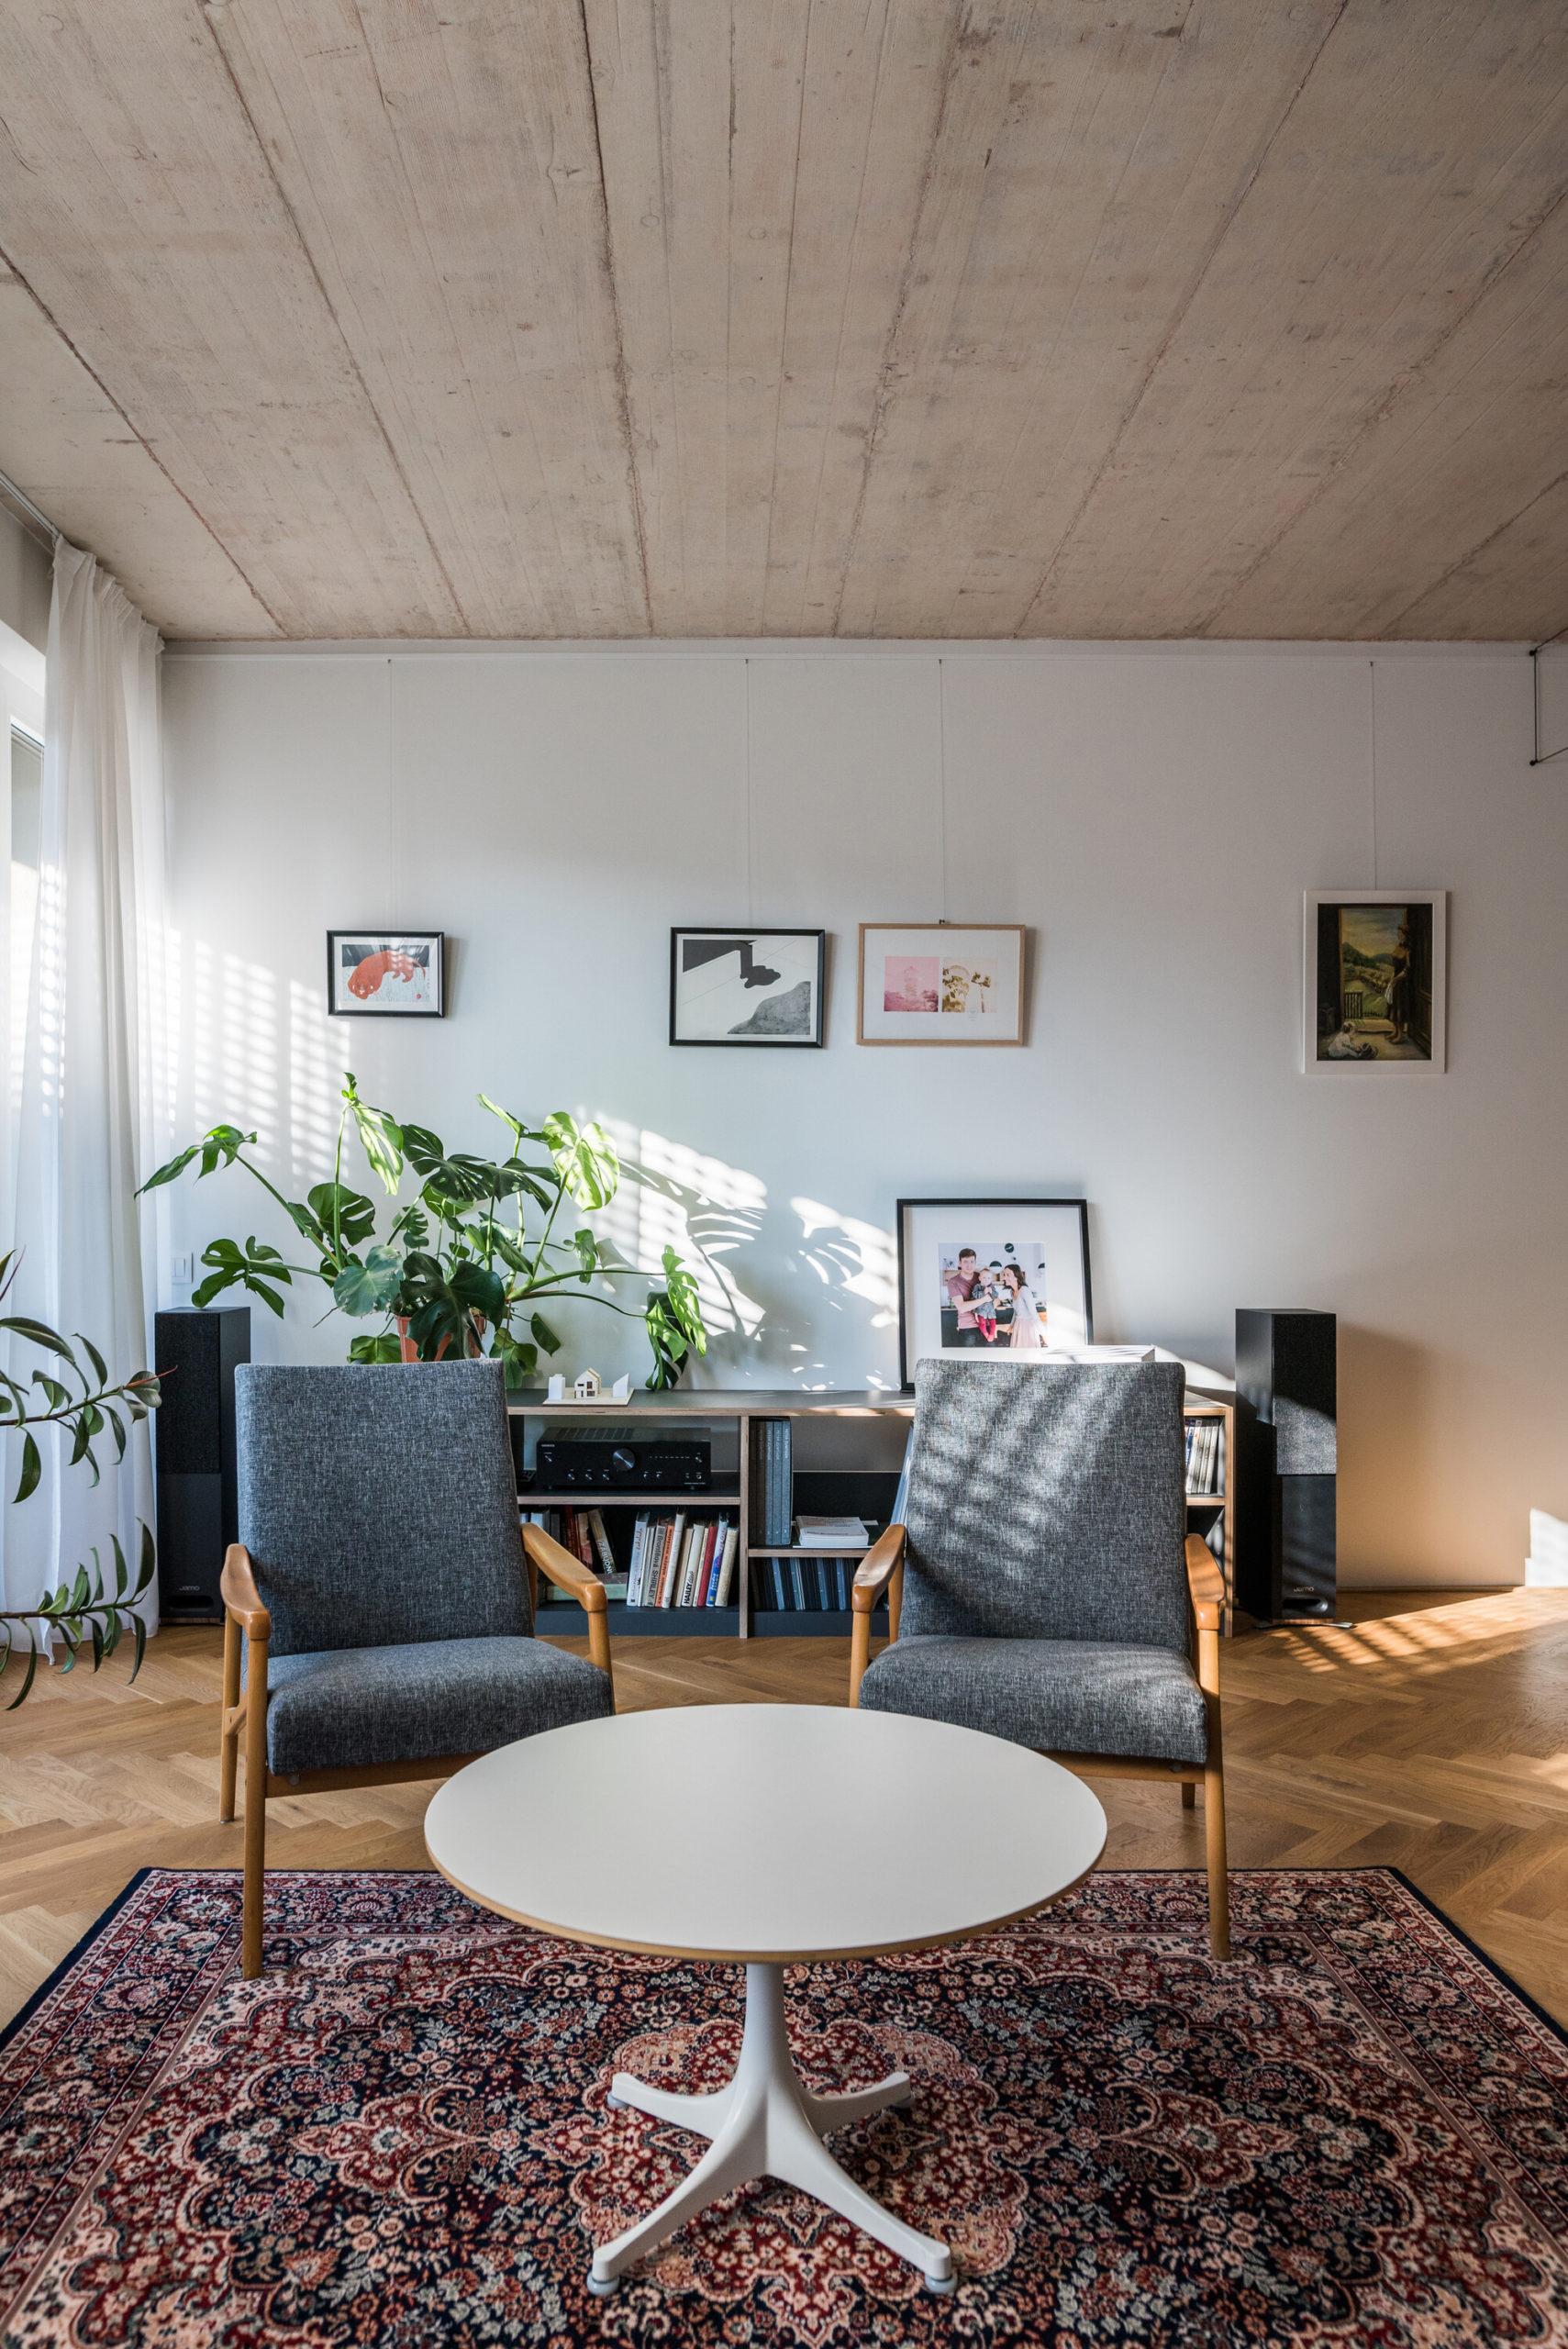 Betónový strop v obývaku s retro křeslami